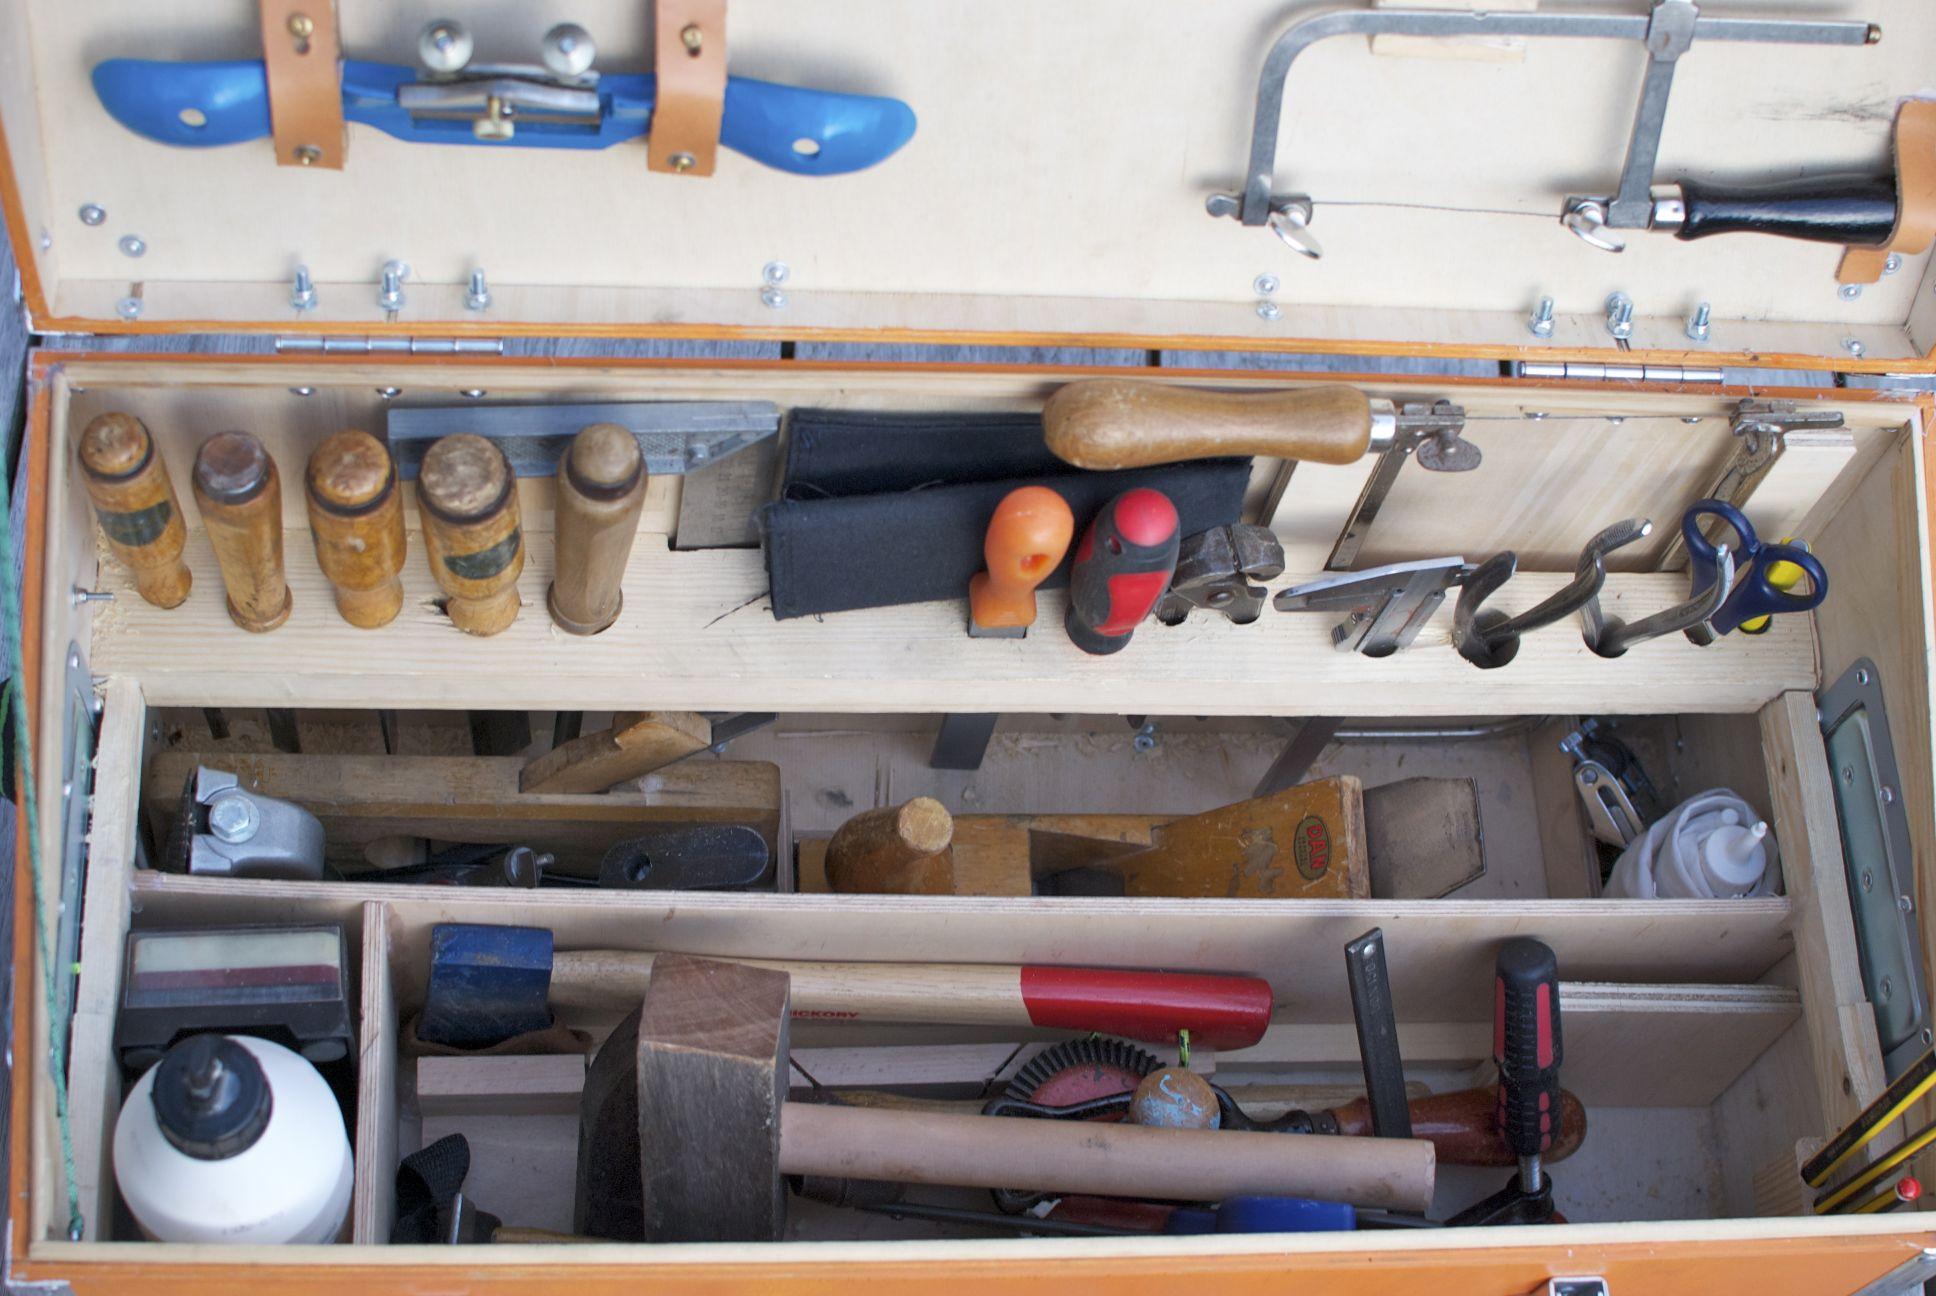 Woodworking tool chest - nisker.net